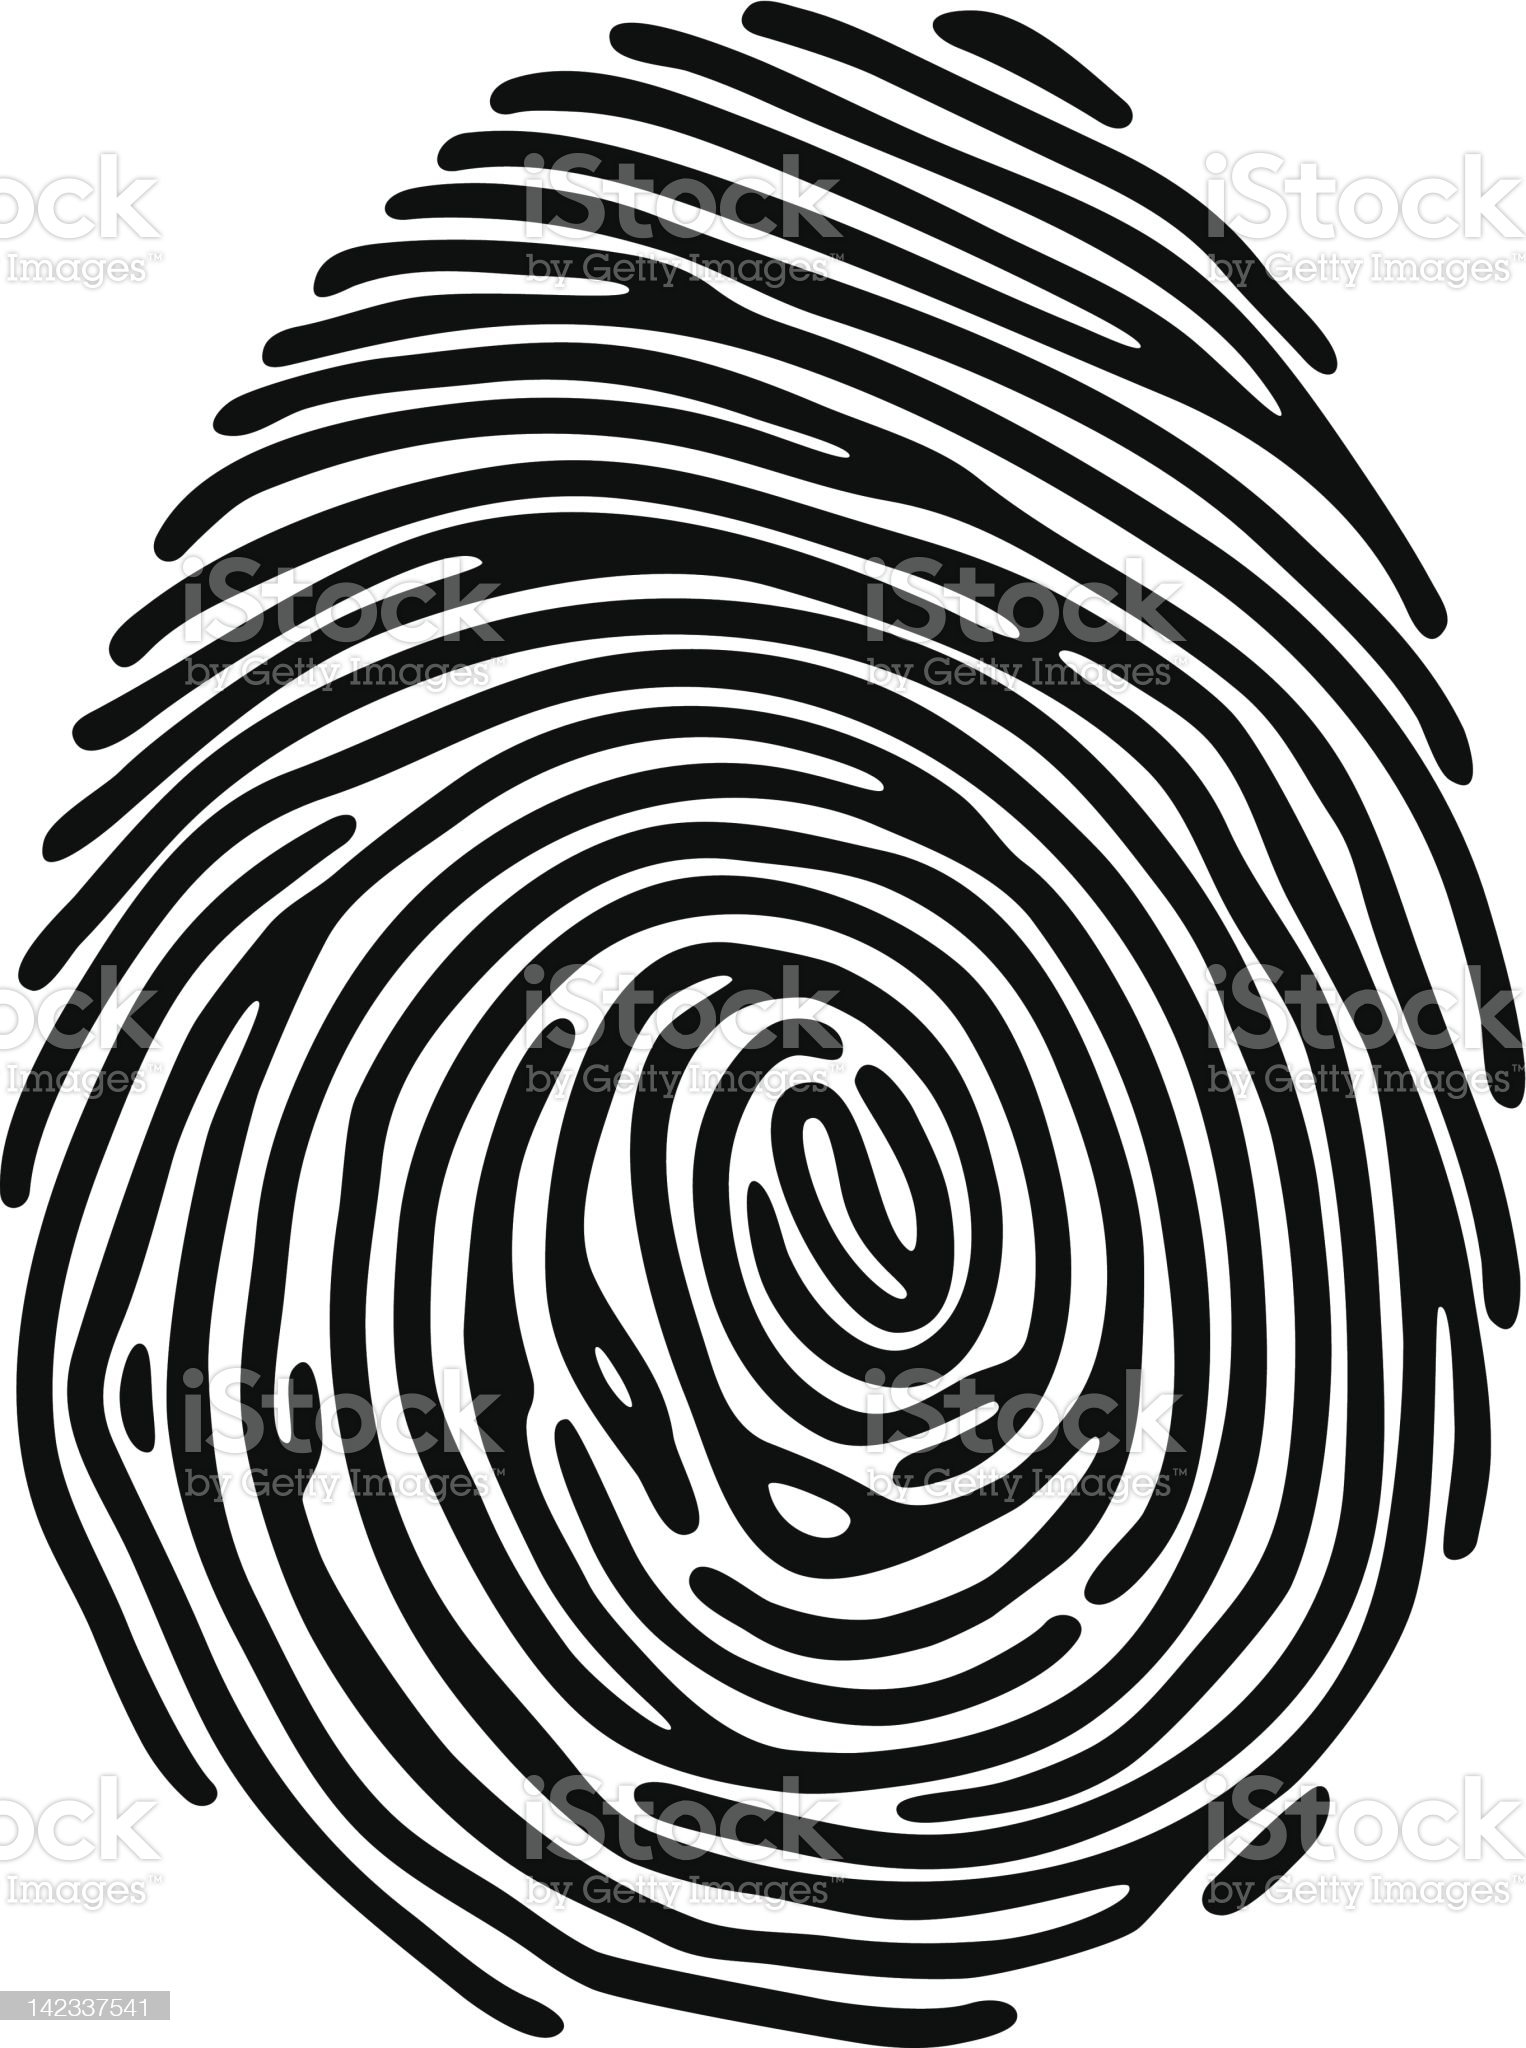 Illustration of a black fingerprint on a white background royalty-free stock vector art